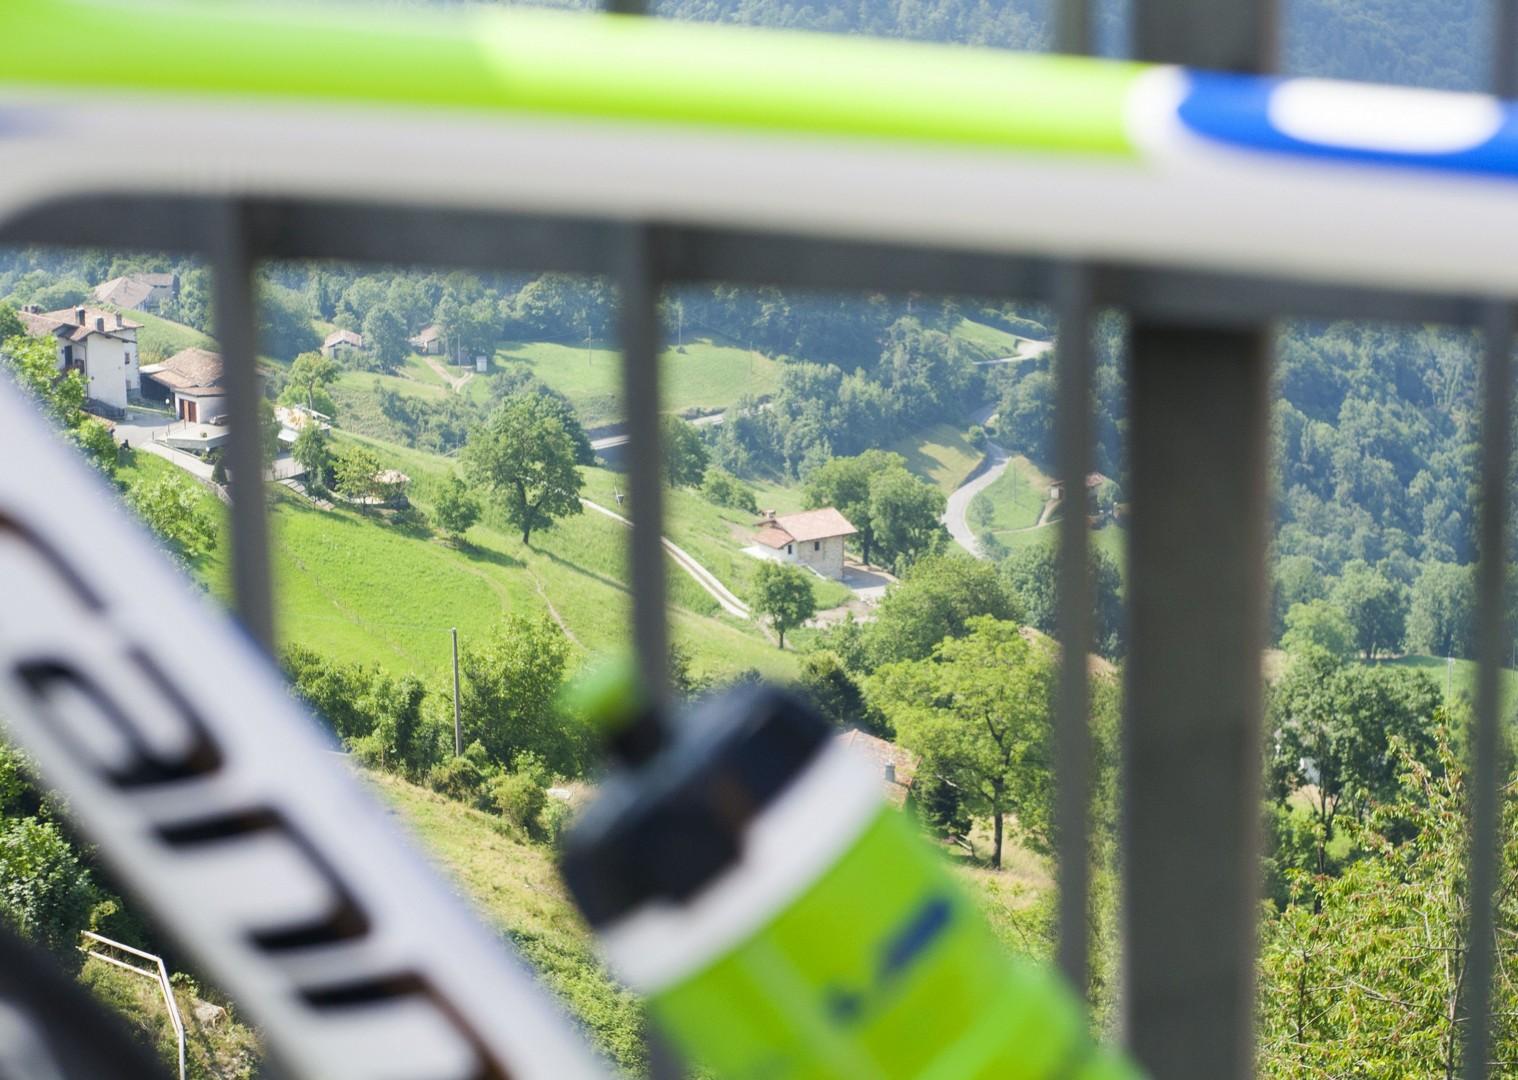 lombardia8.jpg - Italy - Lakes of Lombardia - Guided Road Cycling Holiday - Italia Road Cycling